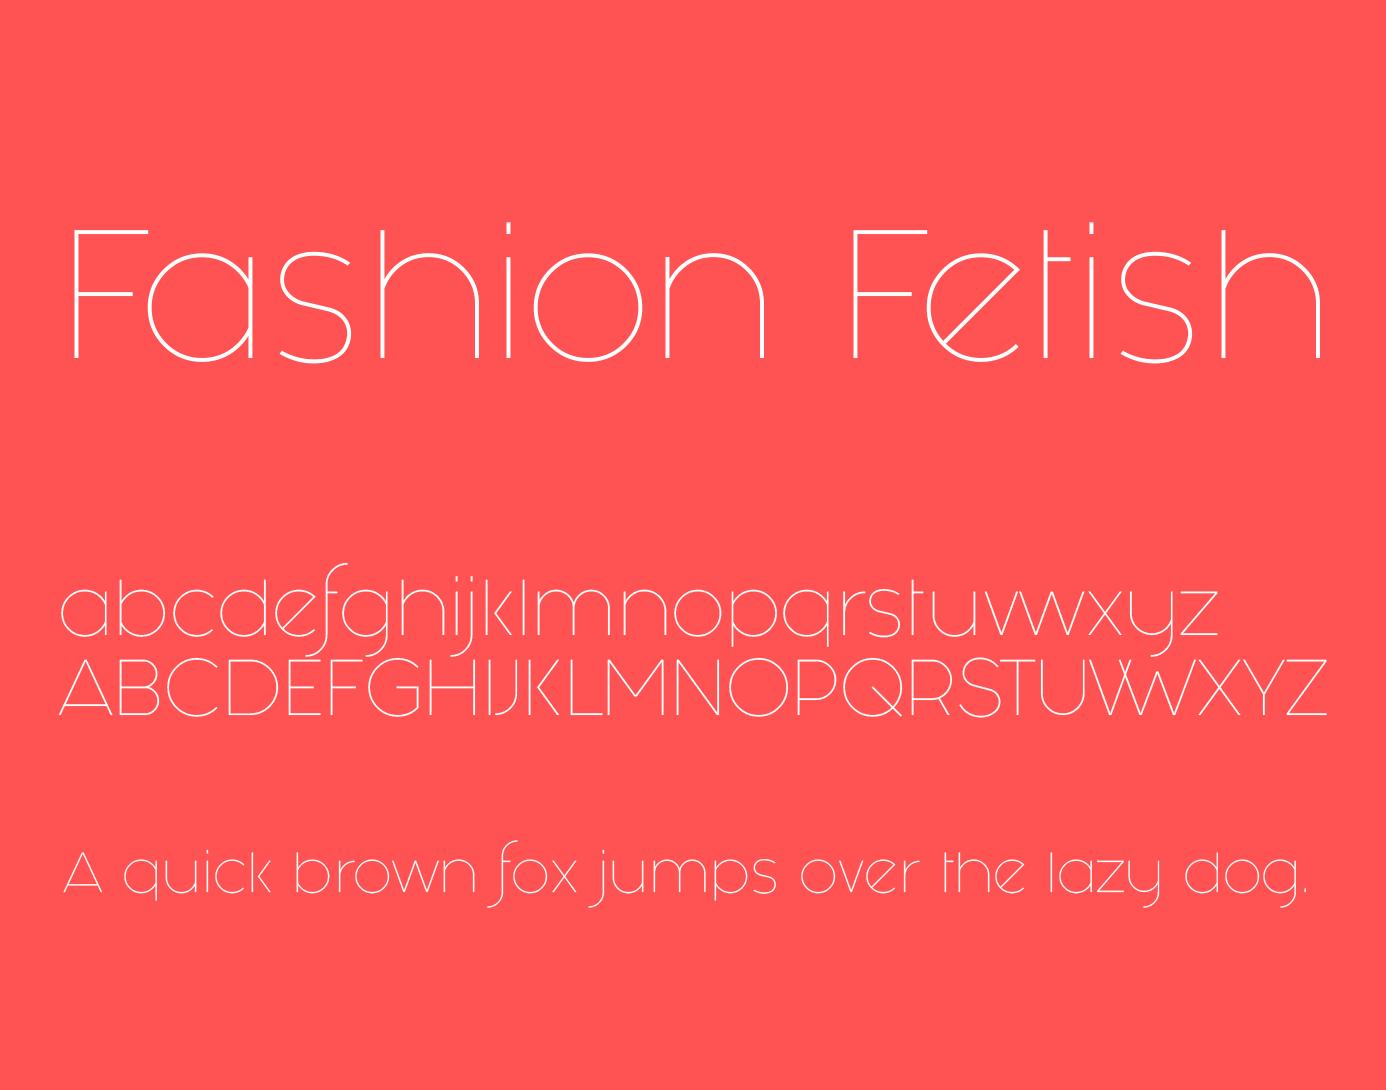 fashion-fetish-font